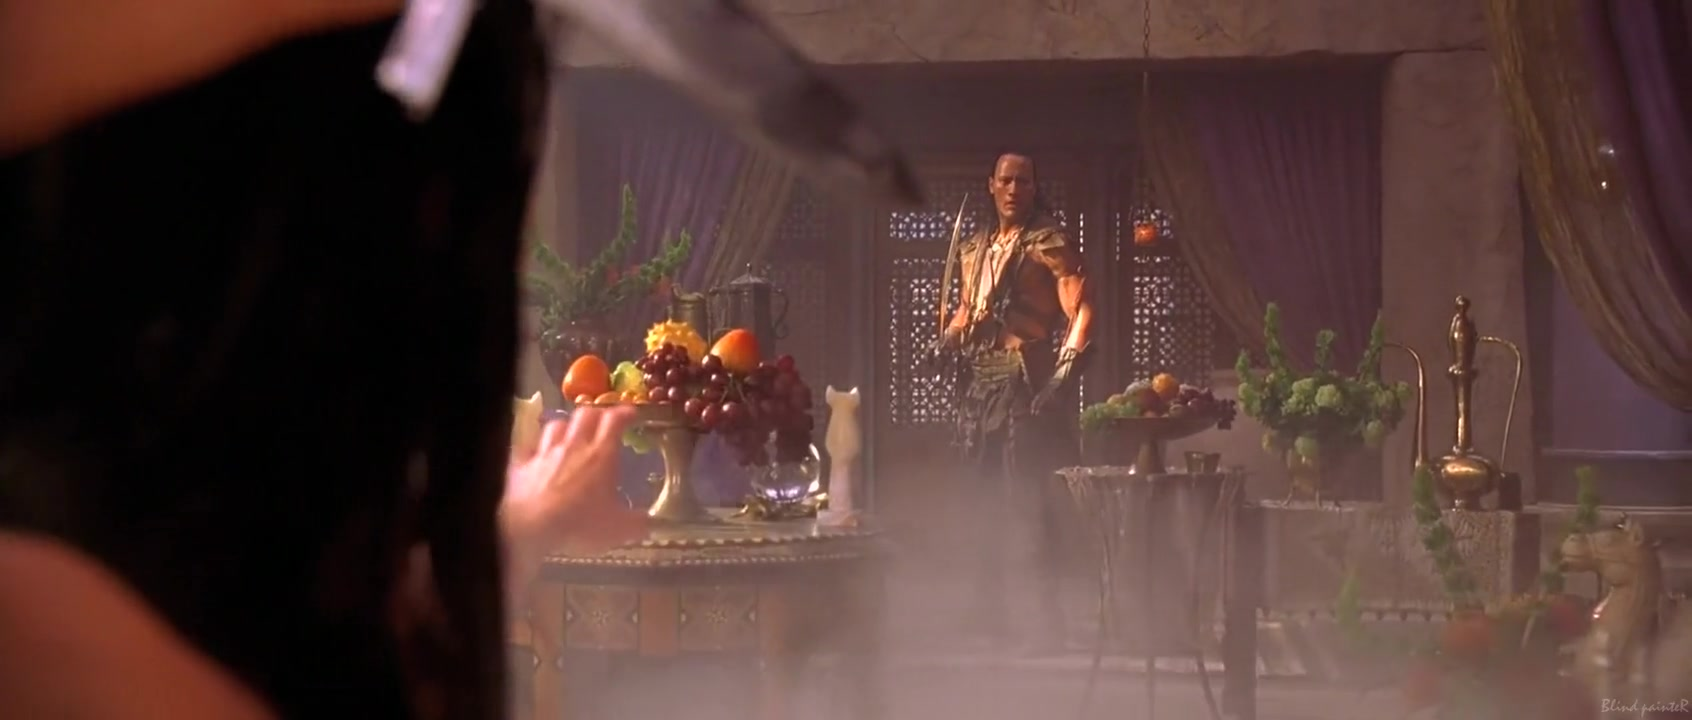 The Scorpion King 2002 Kelly Hu